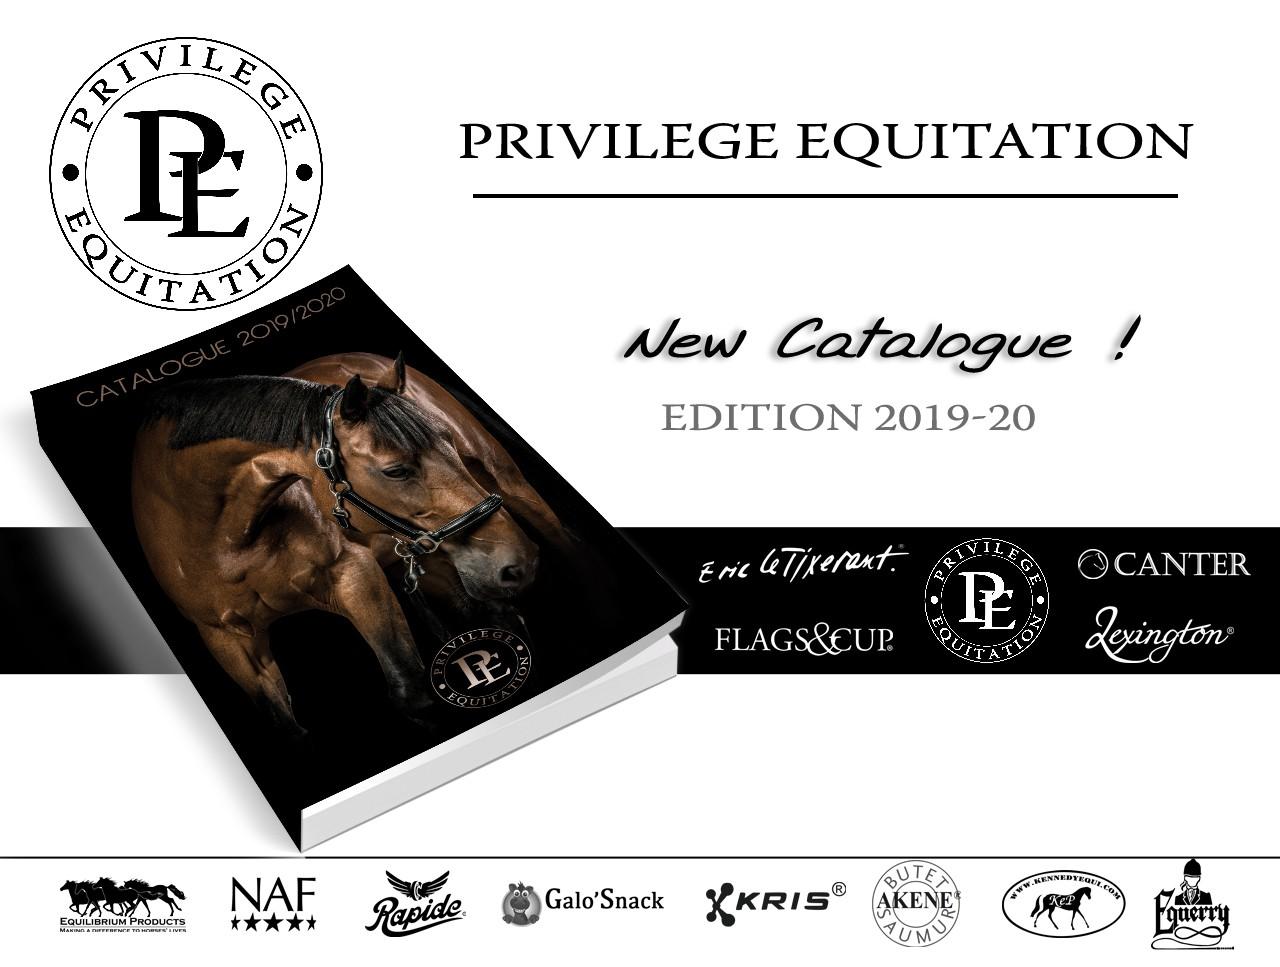 New Catalogue Privilège Equitation 2019-20